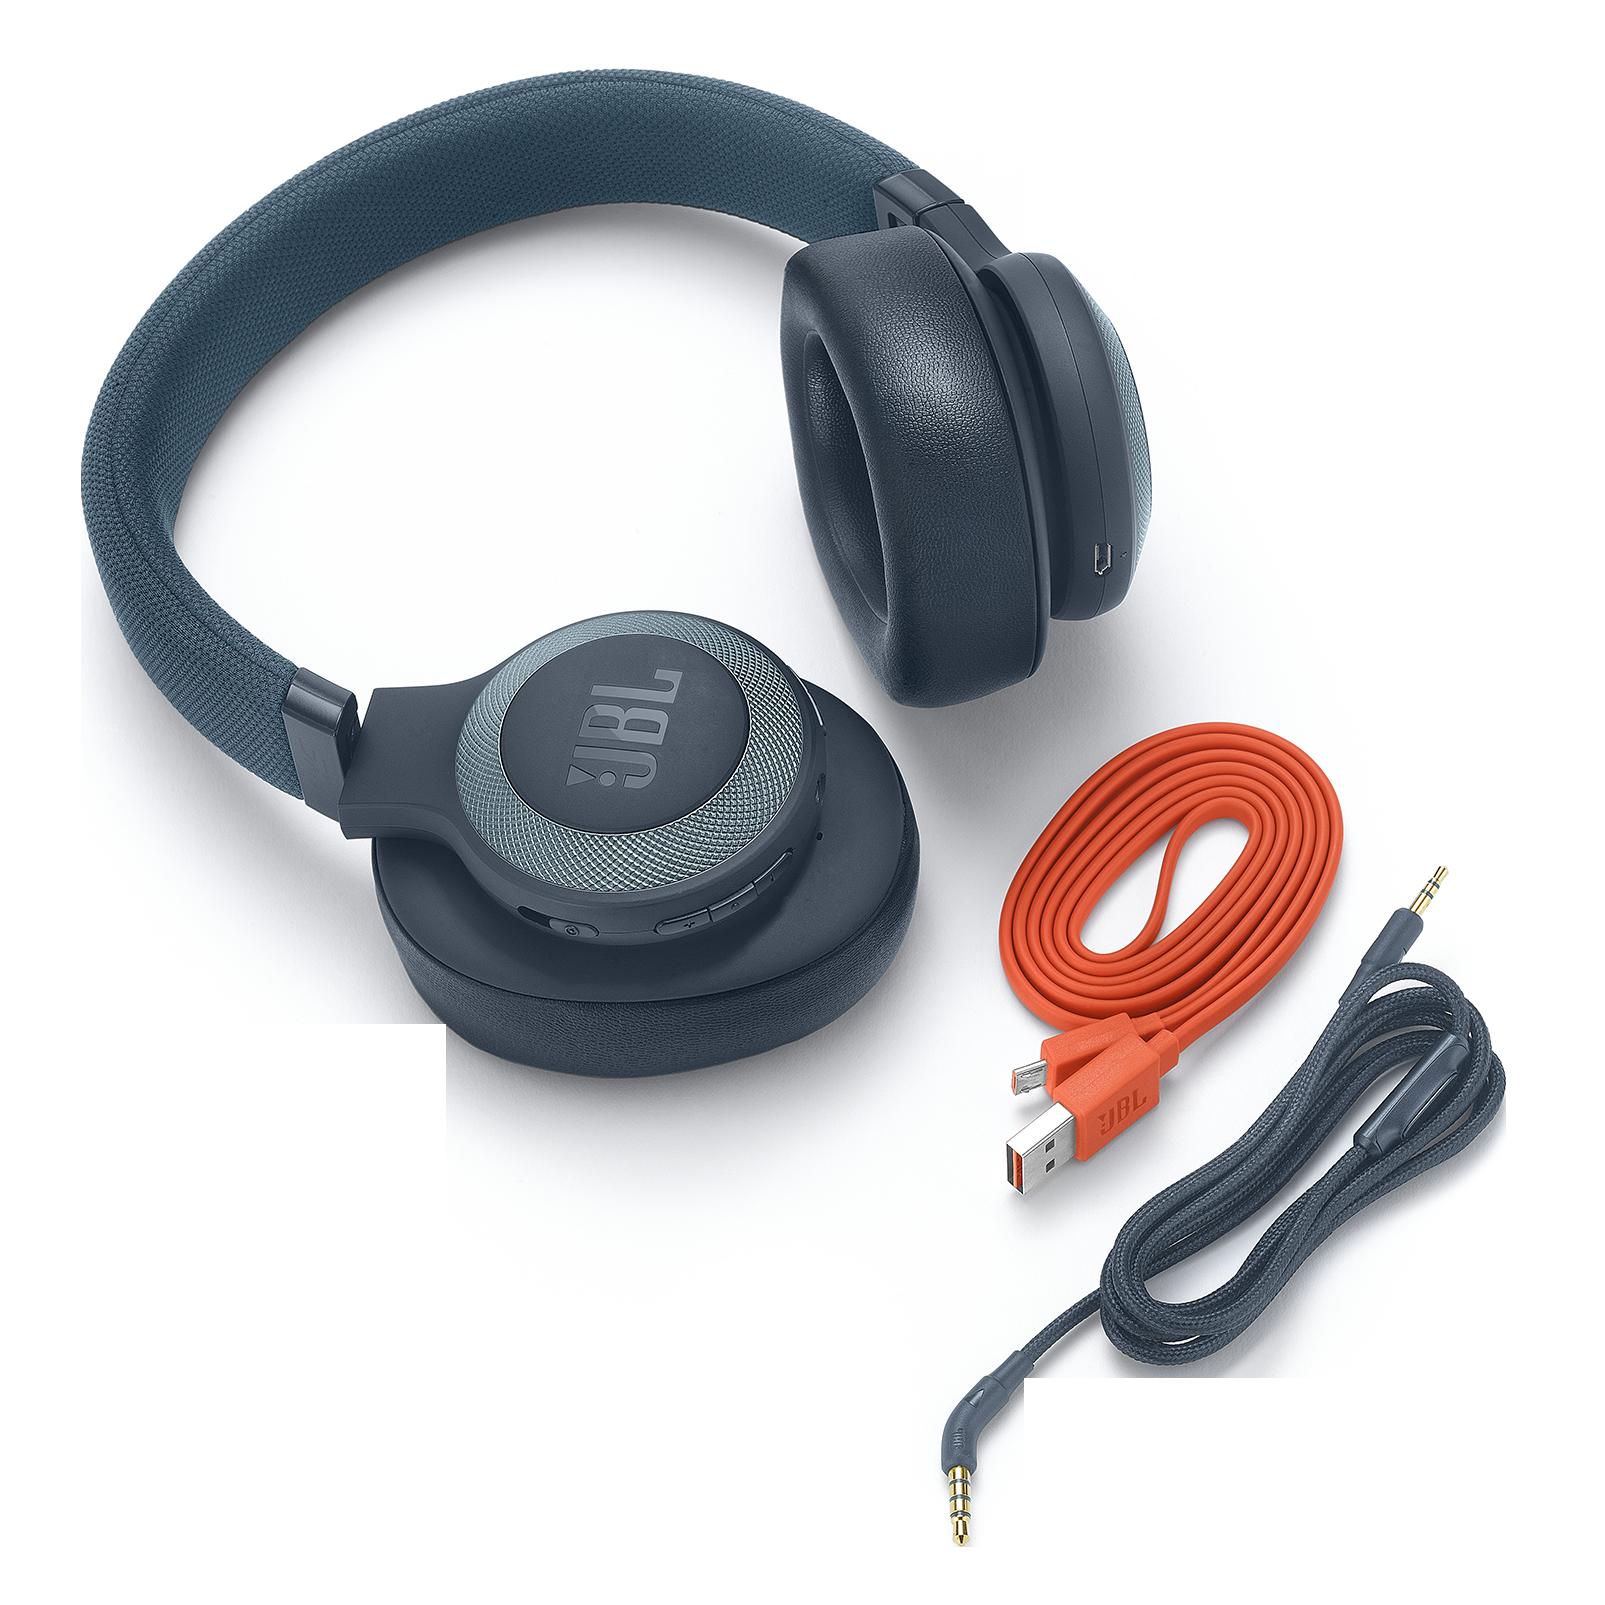 JBL E65BTNC - Blue - Wireless over-ear noise-cancelling headphones - Detailshot 3